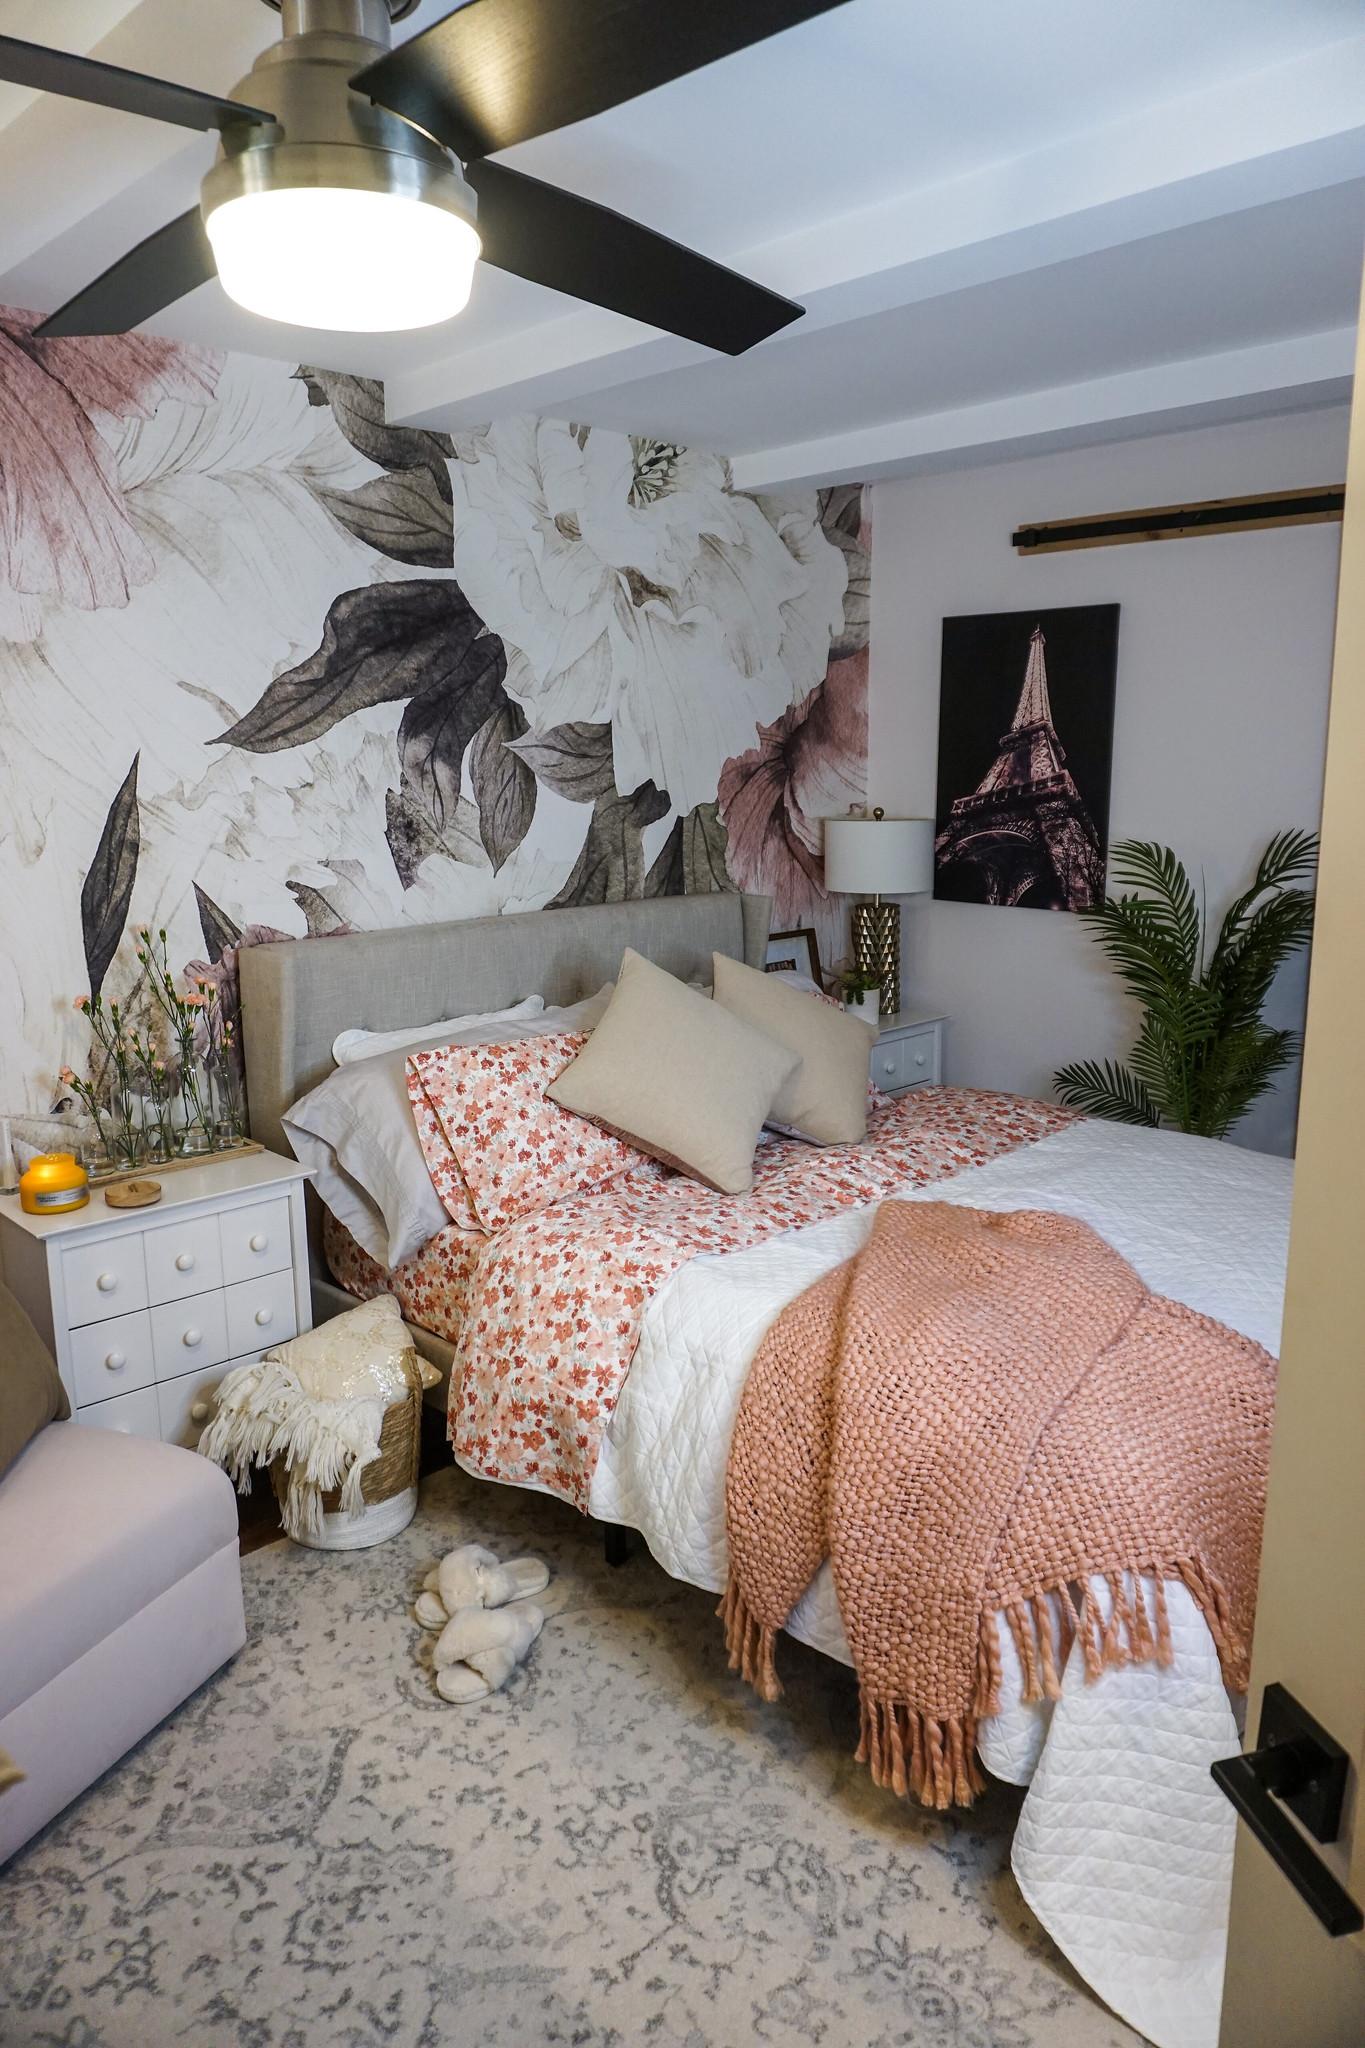 5 Ways to Freshen Up Your Bedroom this August   Bedroom Ideas   Boho Bedroom   Floral Mural Wallpaper   Pink Bedroom   Feminine Bedroom Inspiration   Flower Sheets